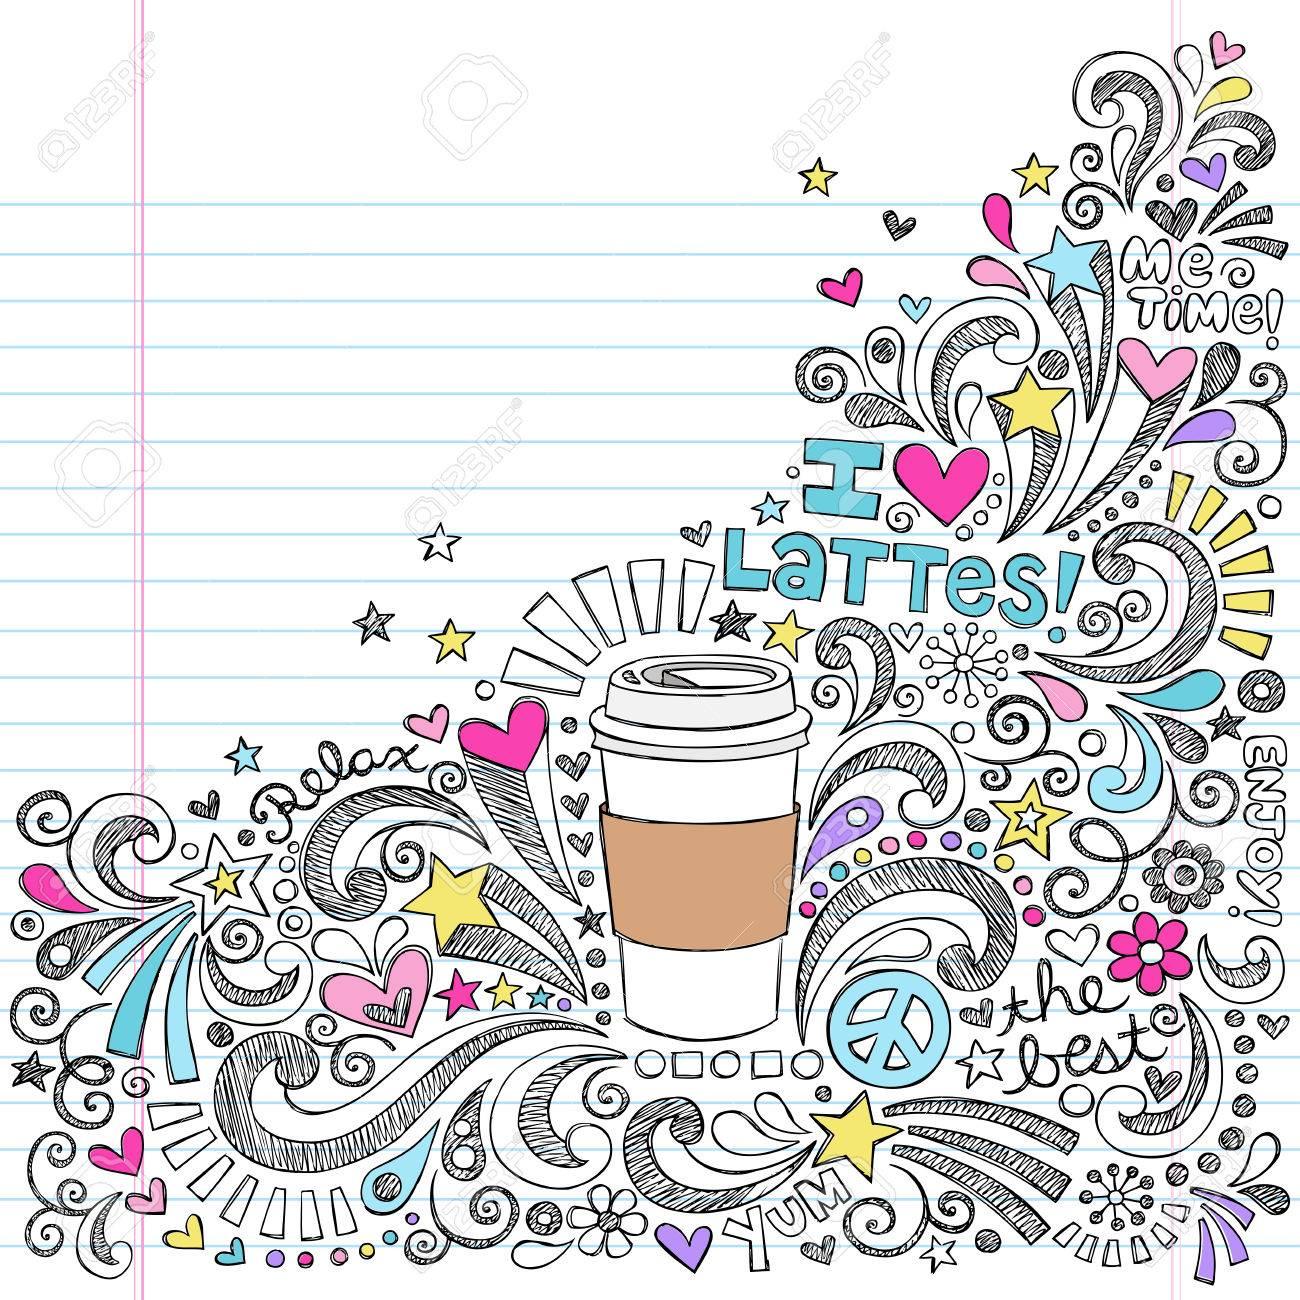 Coffee Latte Hot Drink Back to School Sketchy Notebook Doodles Stock Vector - 23288929